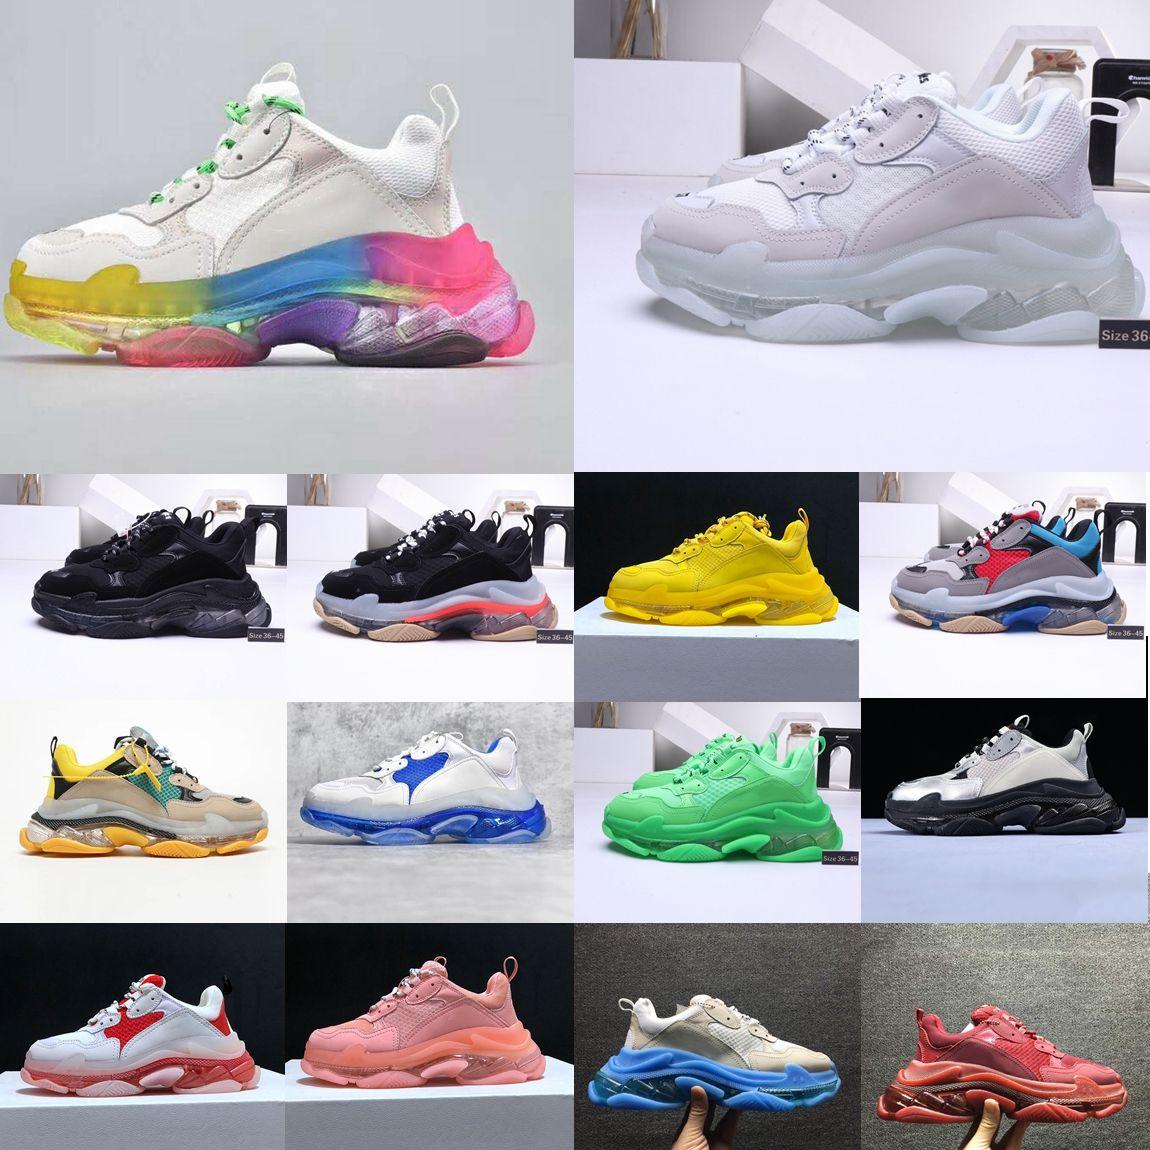 2020 Triple S Sneakers Green Crystal Cushion Bottom Men Women Triple-S Fashion Paris Kanye 17FW Dad Designer Trainers Shoes Size 36-45